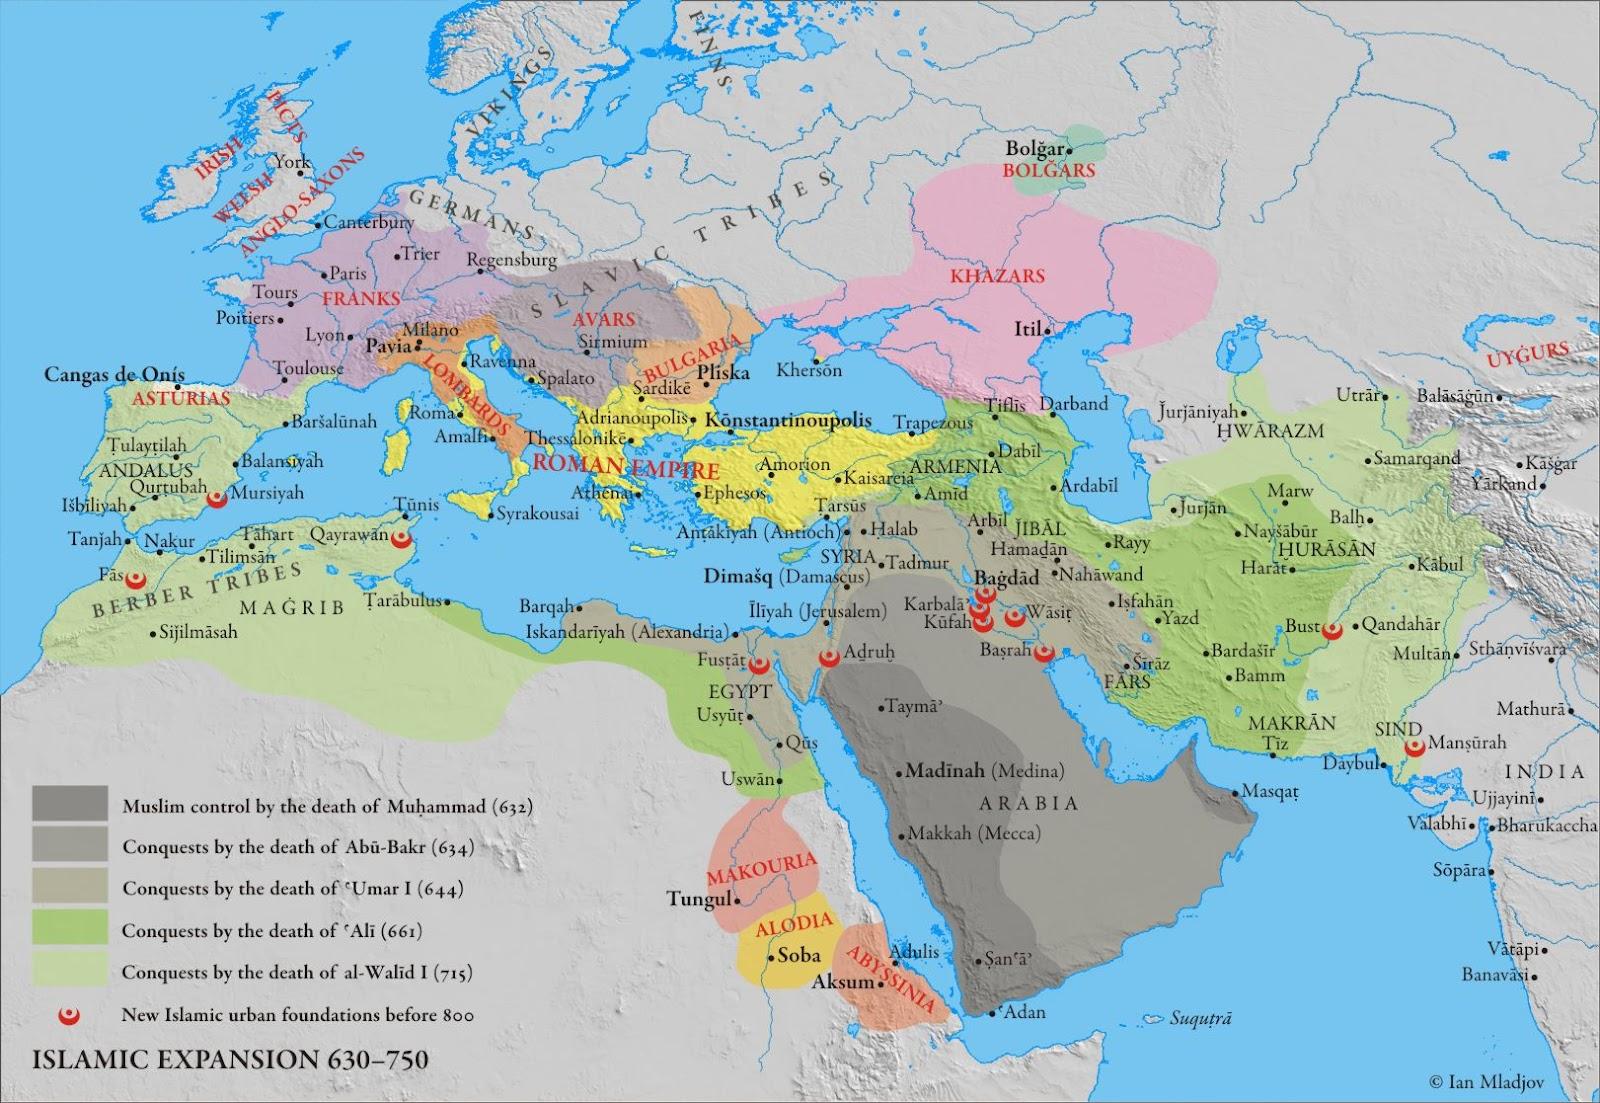 islamicexpansion630-750.jpg